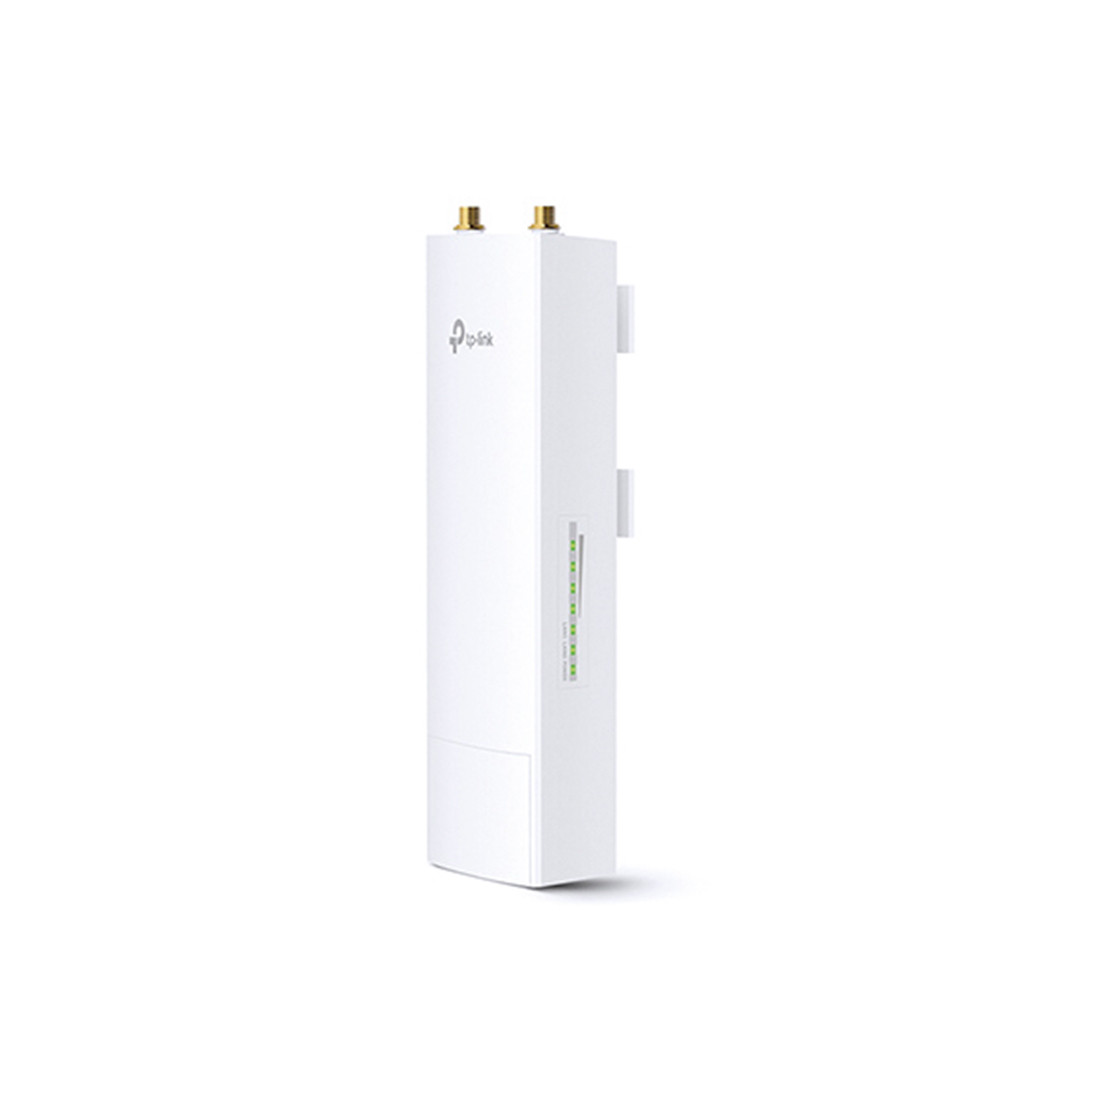 TP-Link WBS210 Наружная базовая станция Wi-Fi 2,4 ГГц 300 Мбит/с